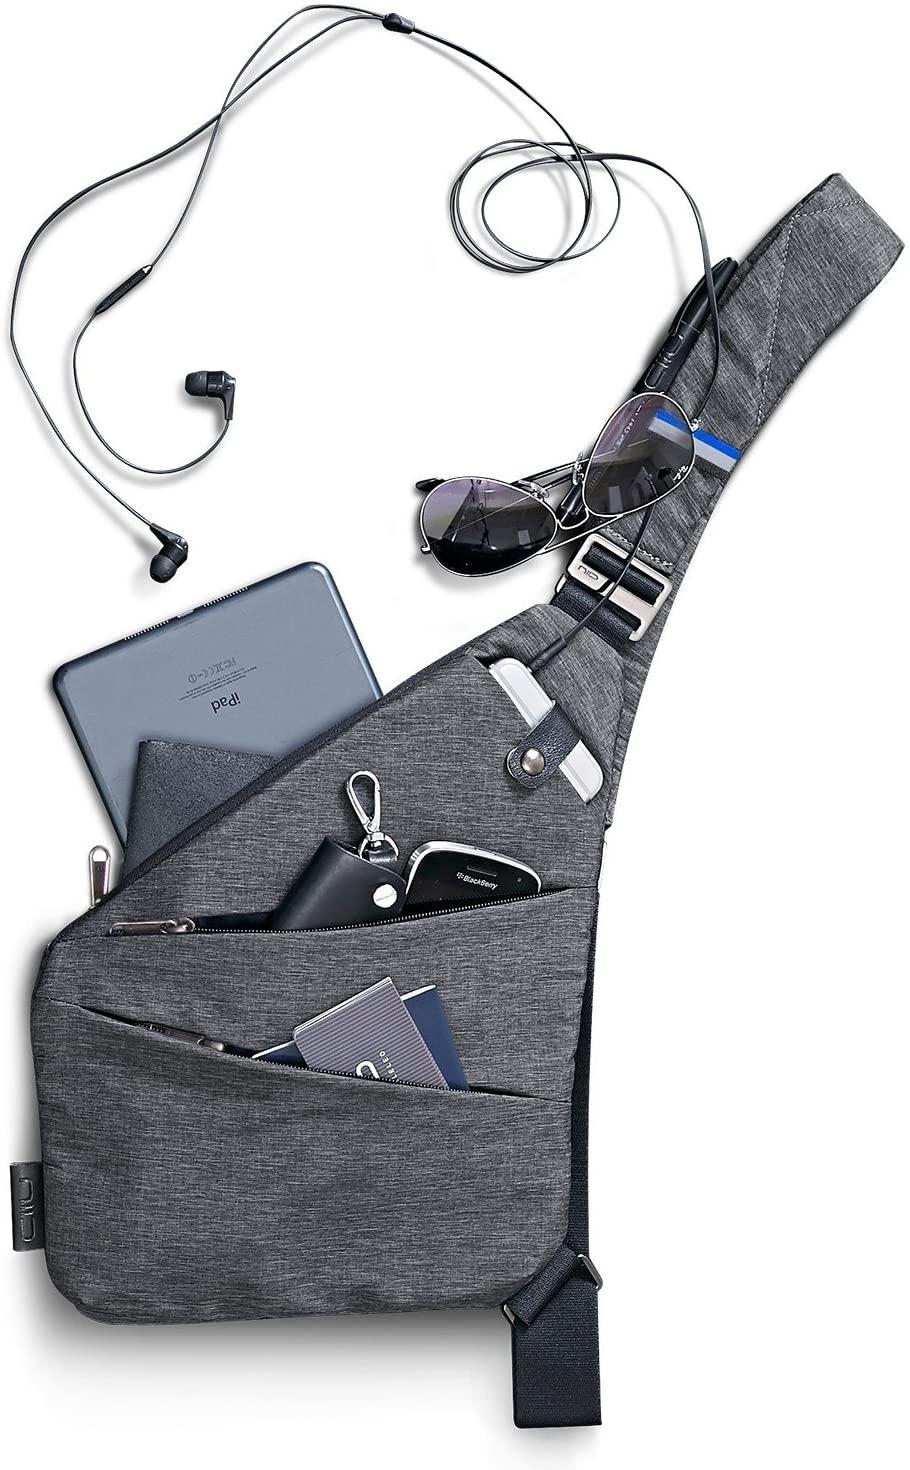 NIID FINO Sling Bag Multipurpose Slim Backpack waterproof and Anti-Theft Travel Chest Bag for Men Women(Left Hand)